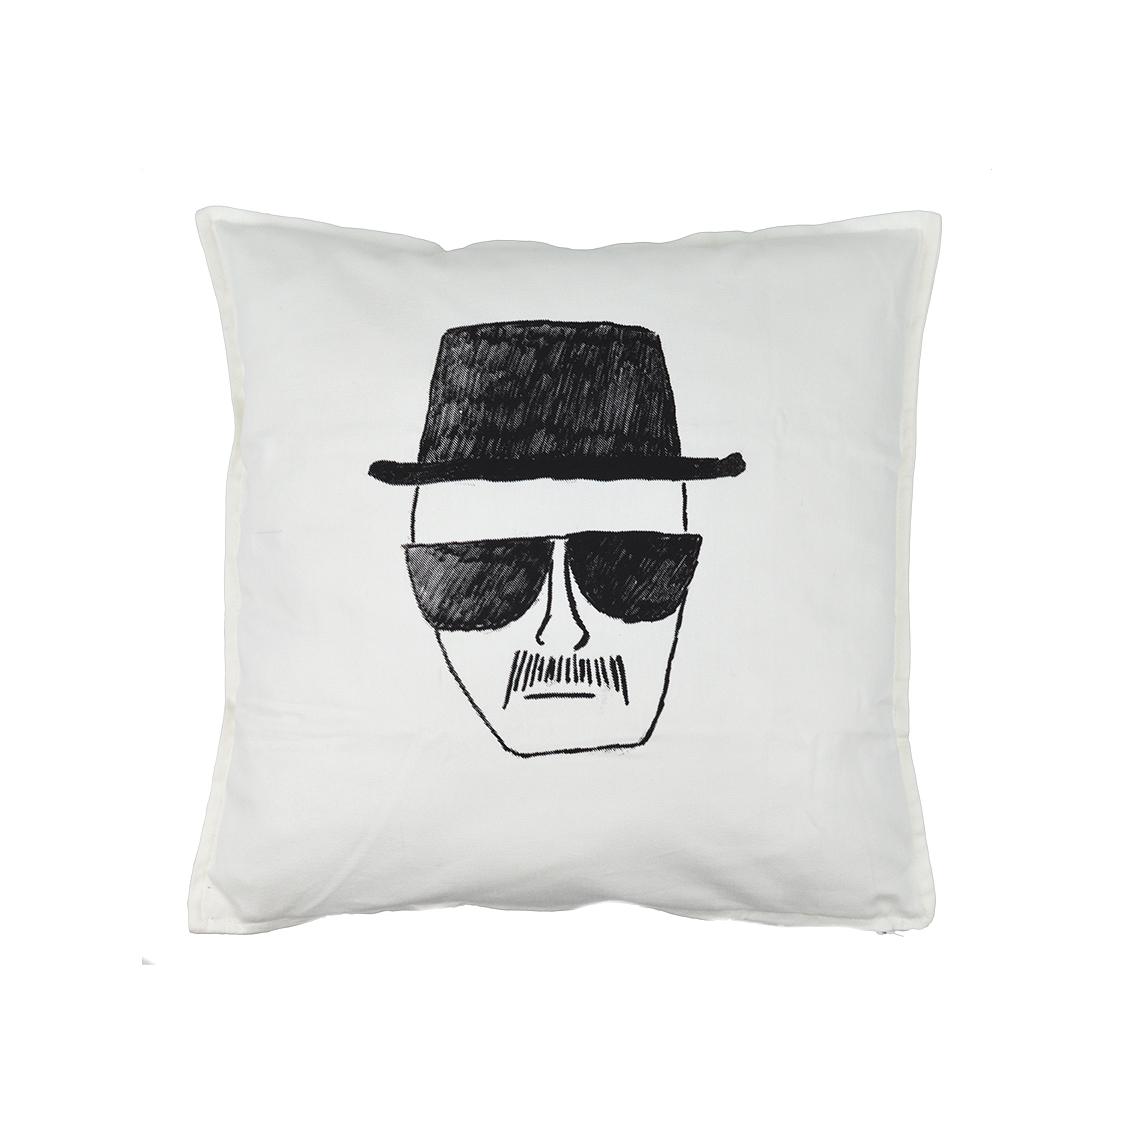 Cuscini Breaking Bad.Identikit Breaking Bad Cuscino 50 50 Bianco Su Faces Tshirt Store